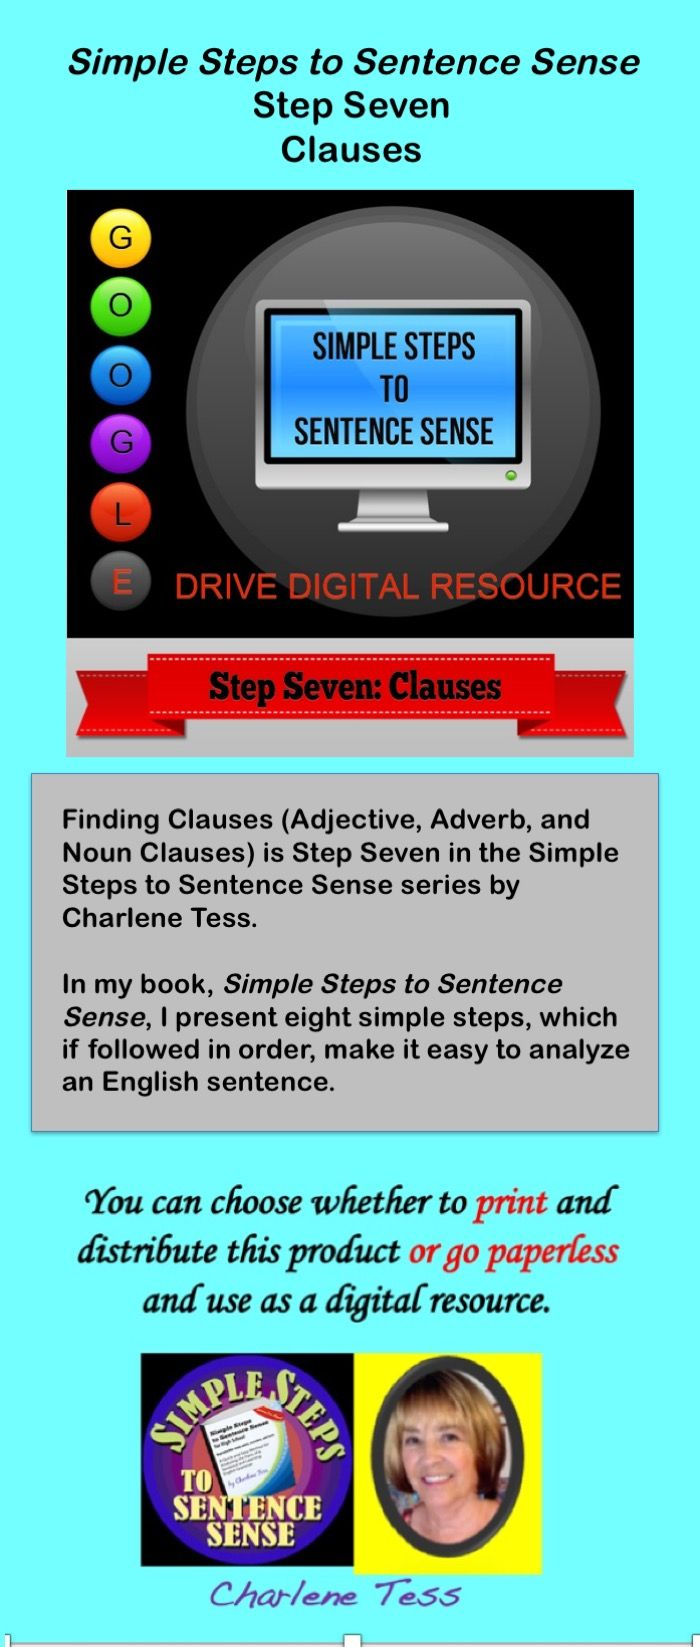 Go #paperless with this #GoogleDrive Digital resource. #TpTdigital